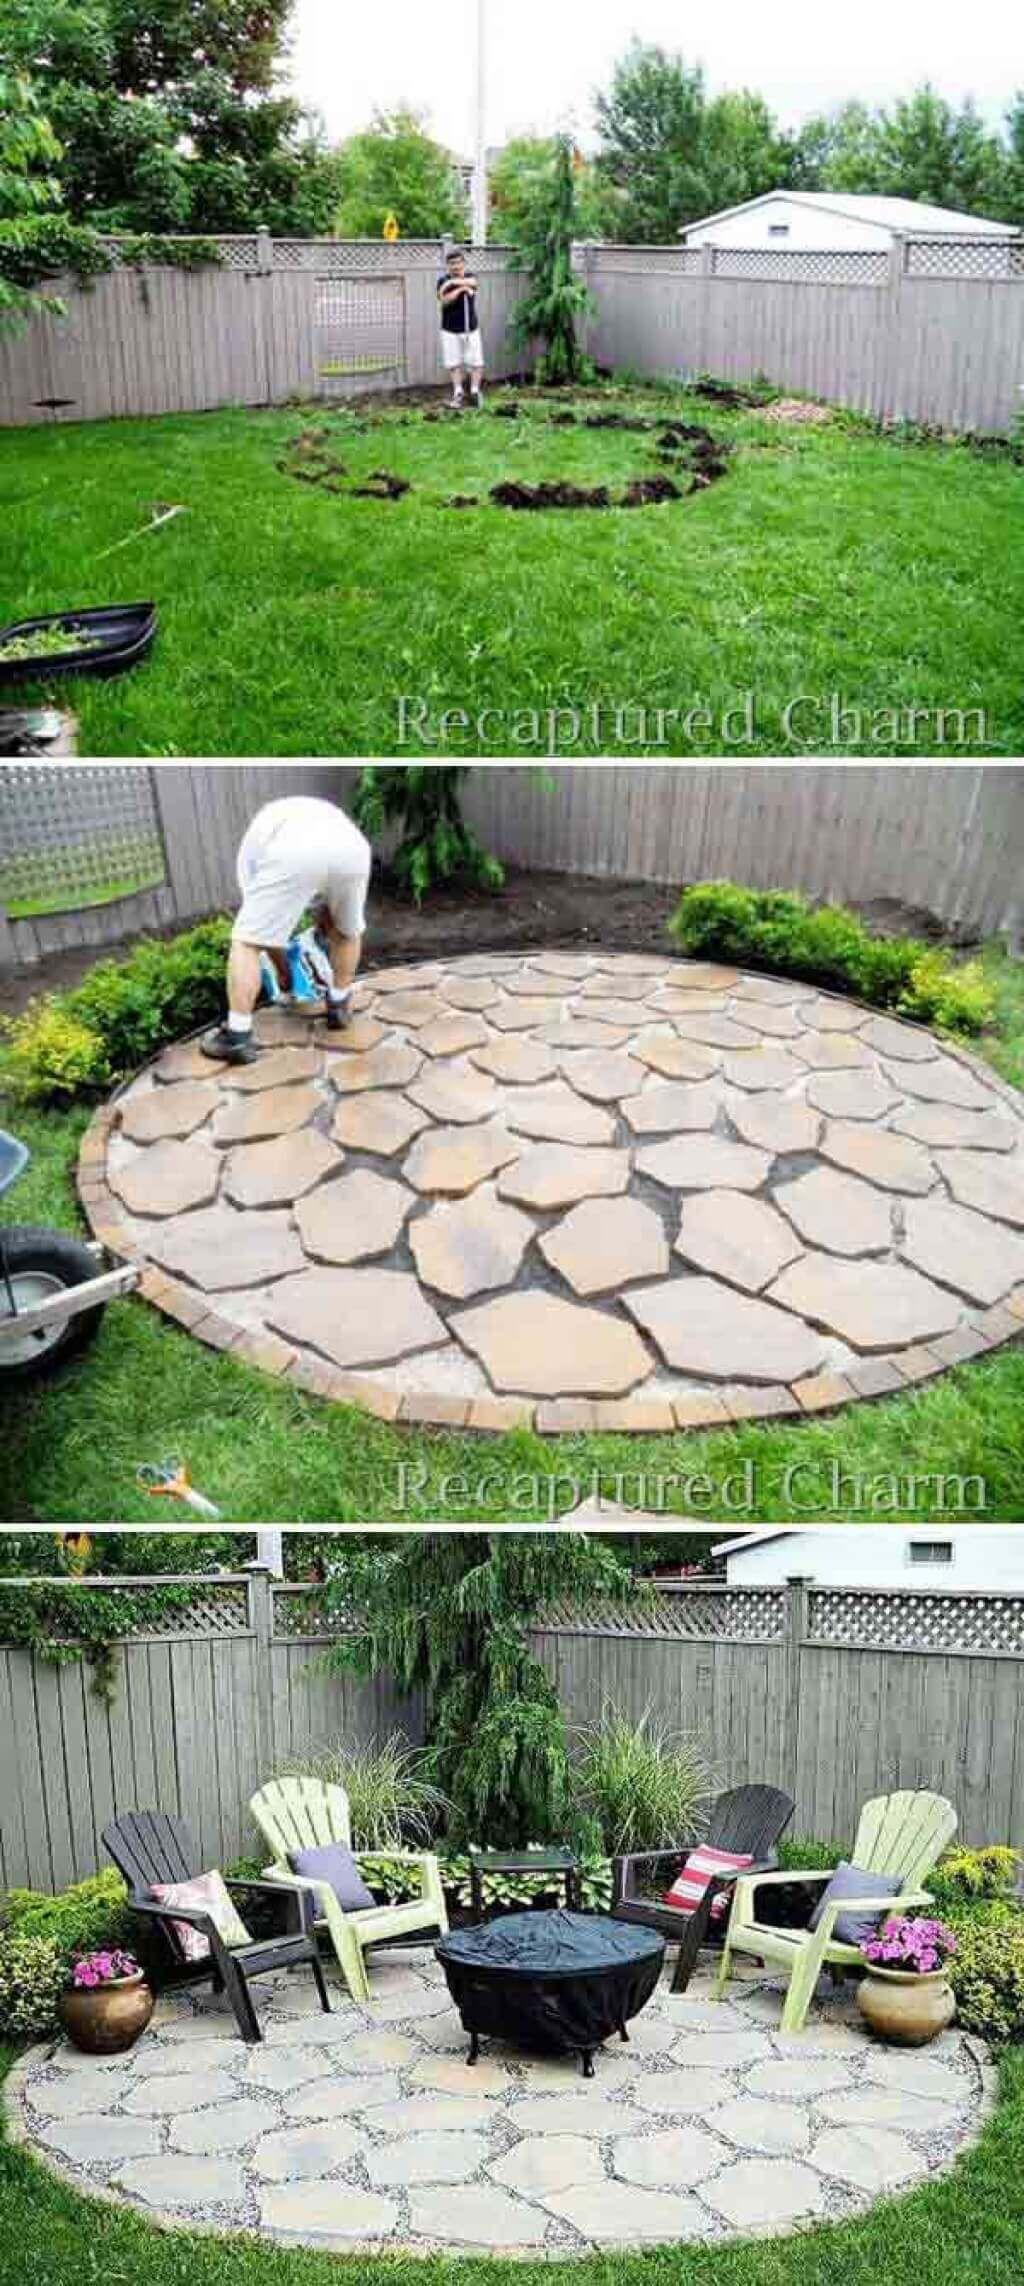 A Stone Patio For Backyard Entertainment Backyard Easy Landscaping Diy Backyard